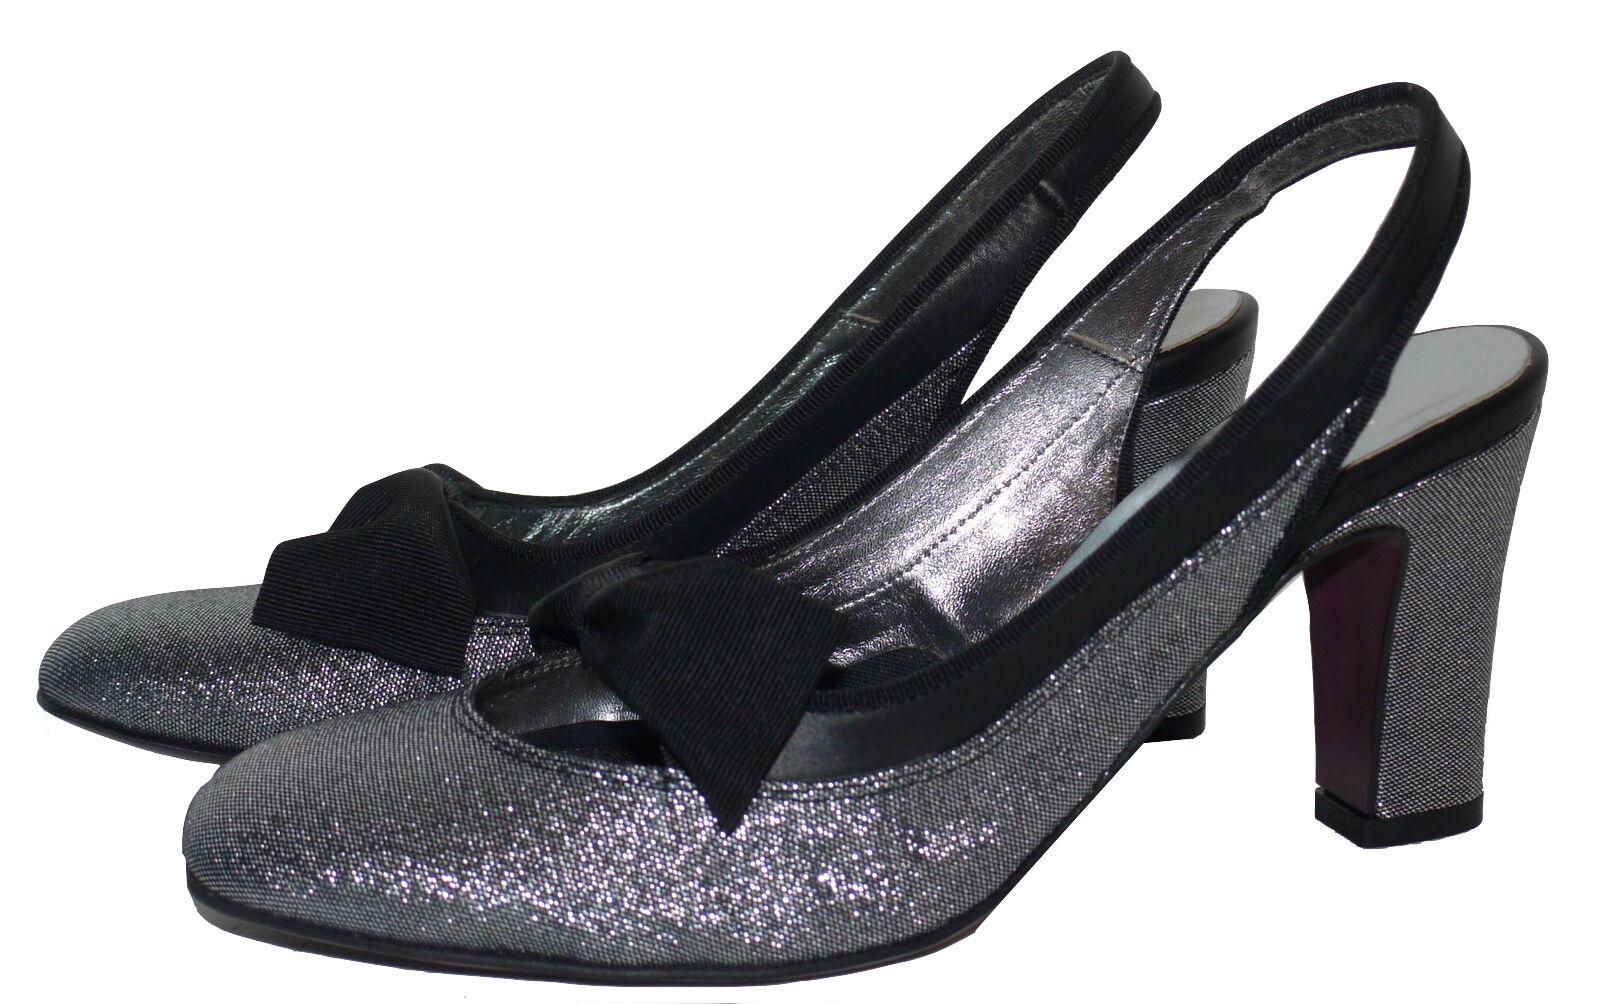 Luc Berjen Lame Slingbacks Größes Schuhes Sandales Various Colour Größes Slingbacks NIB SP 39a647